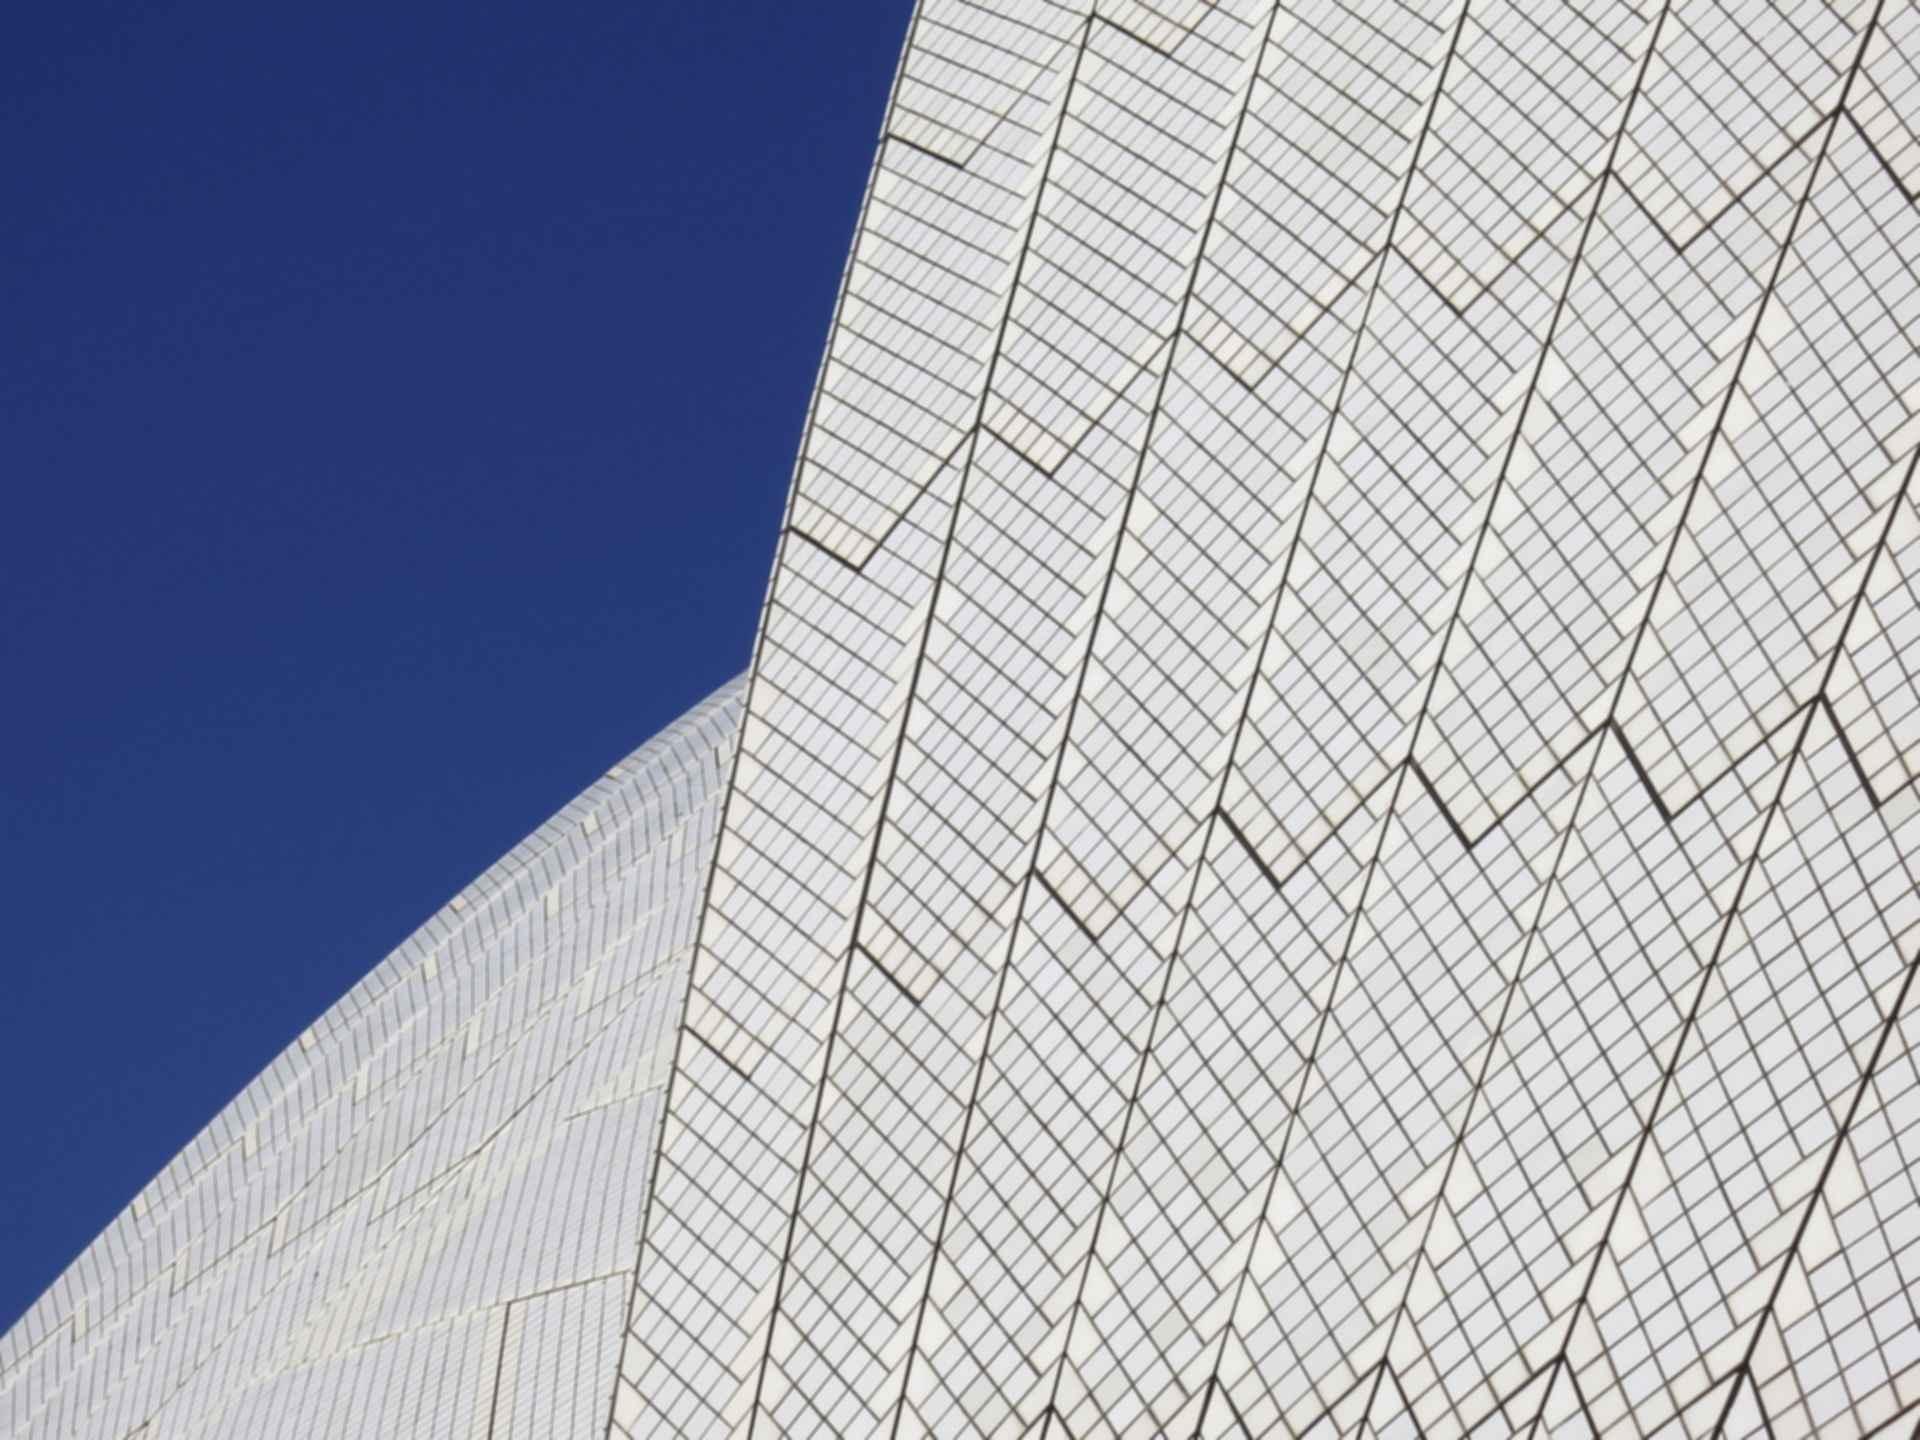 Sydney Opera House - Roof Tiling